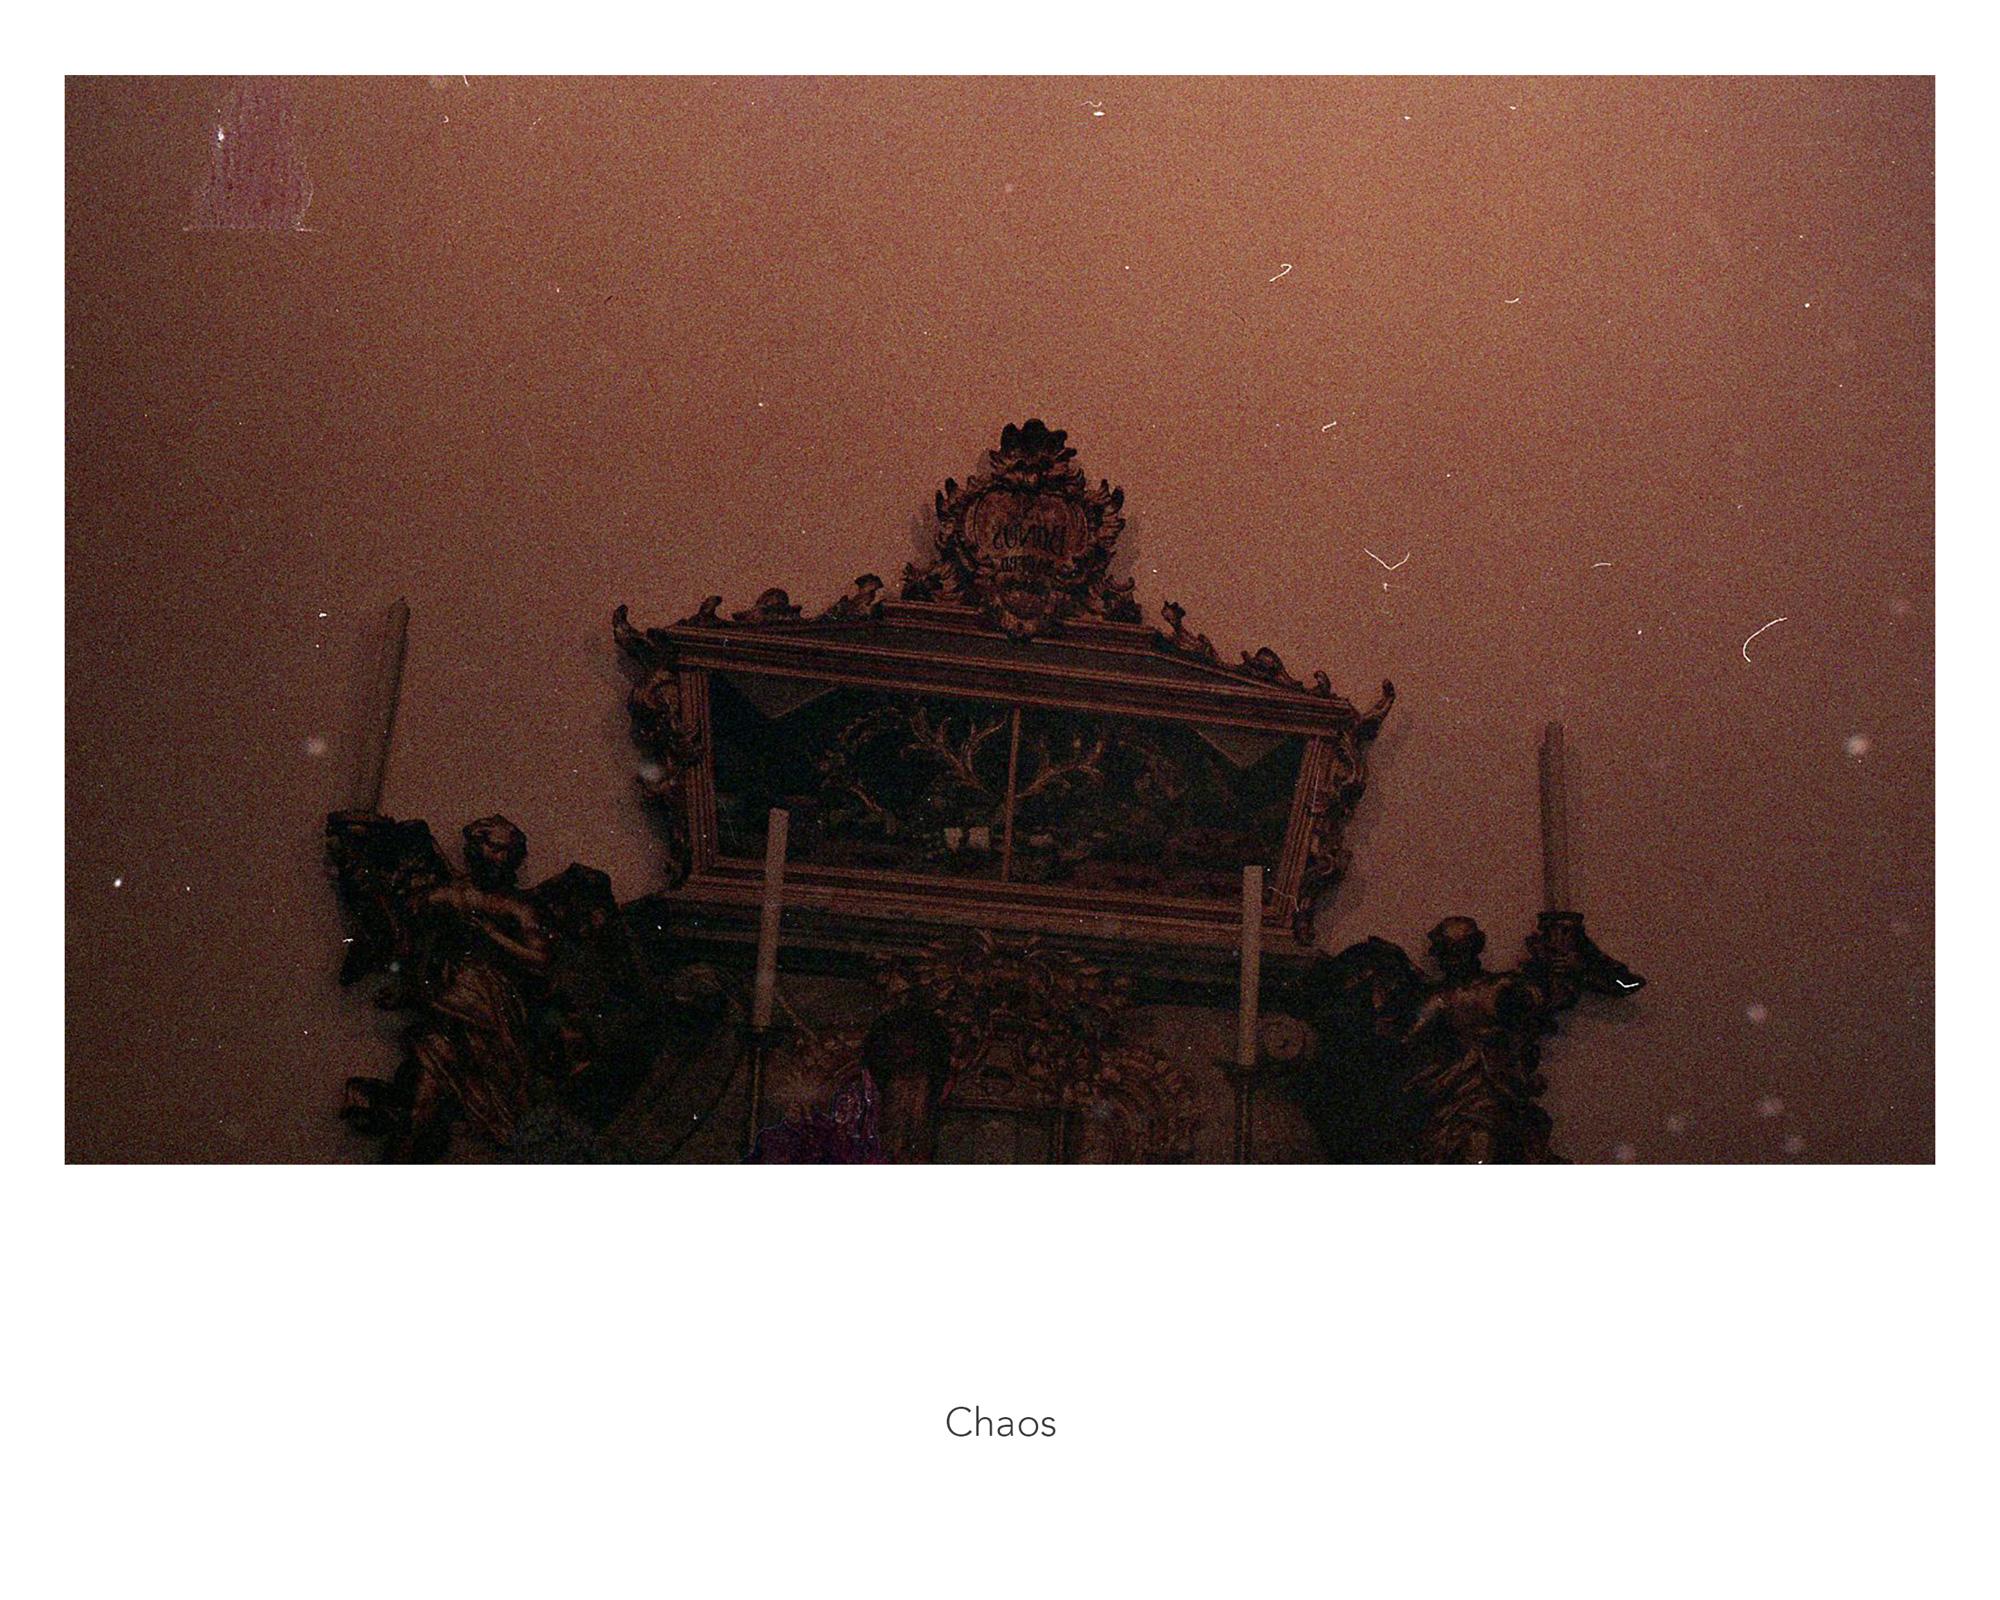 39_Chaos_web.jpg